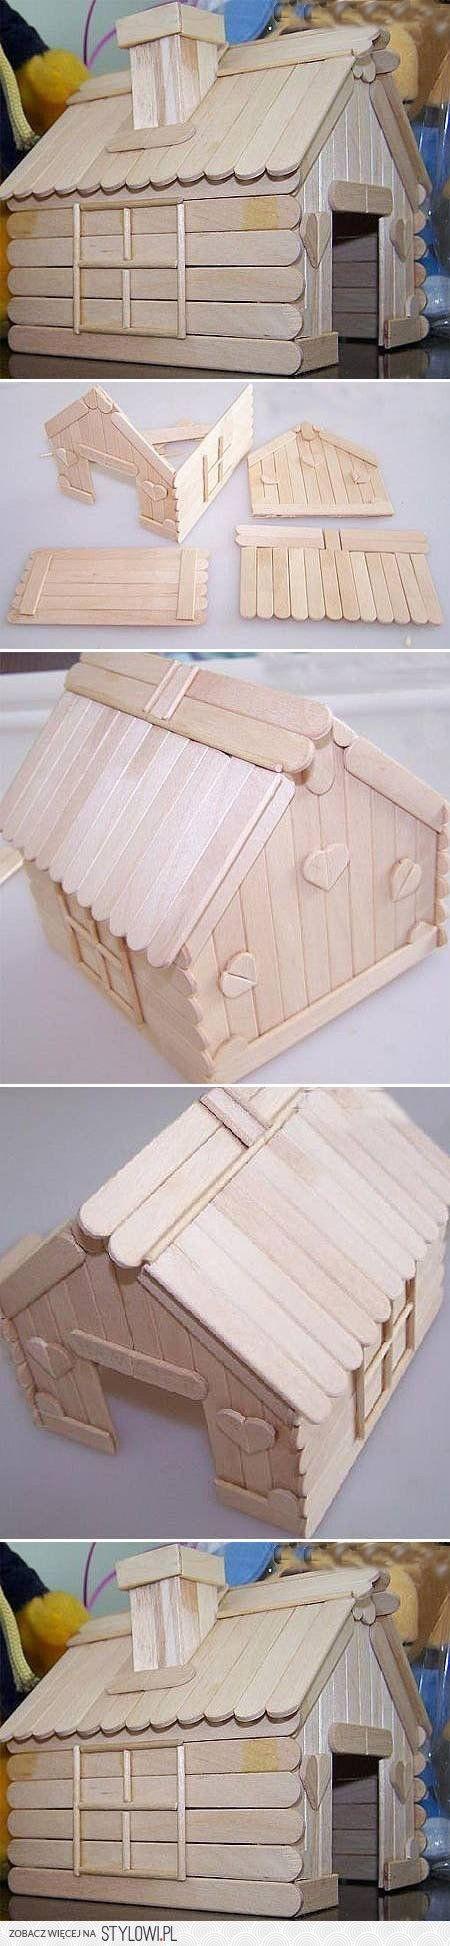 DIY Popsicle Stick House DIY Projects | UsefulDIY.com